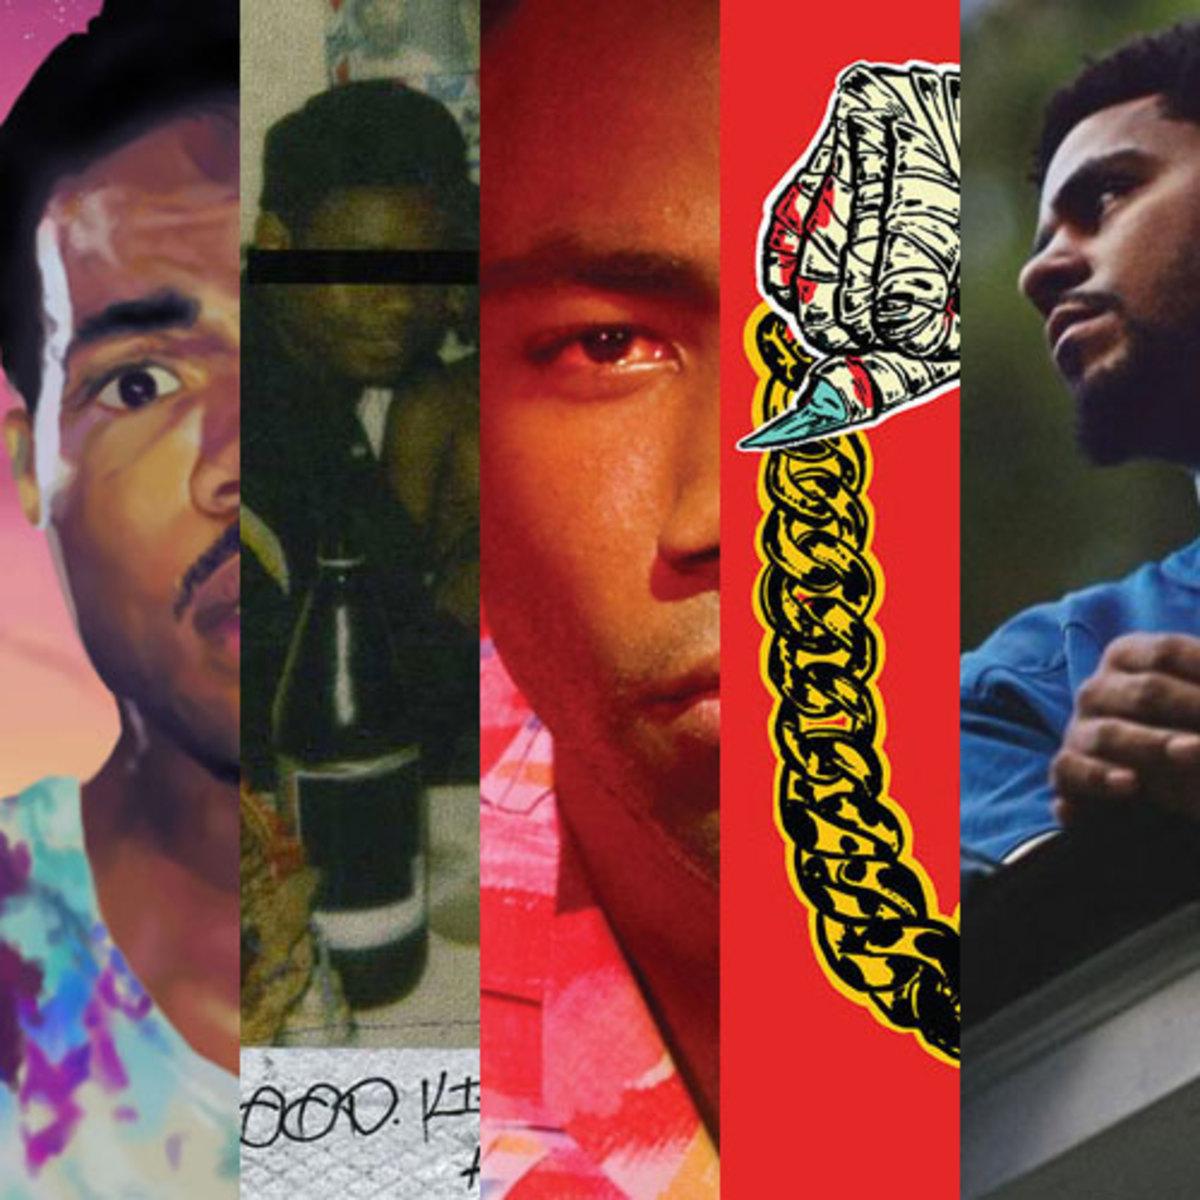 best-new-hip-hop-album-last-5-years.jpg